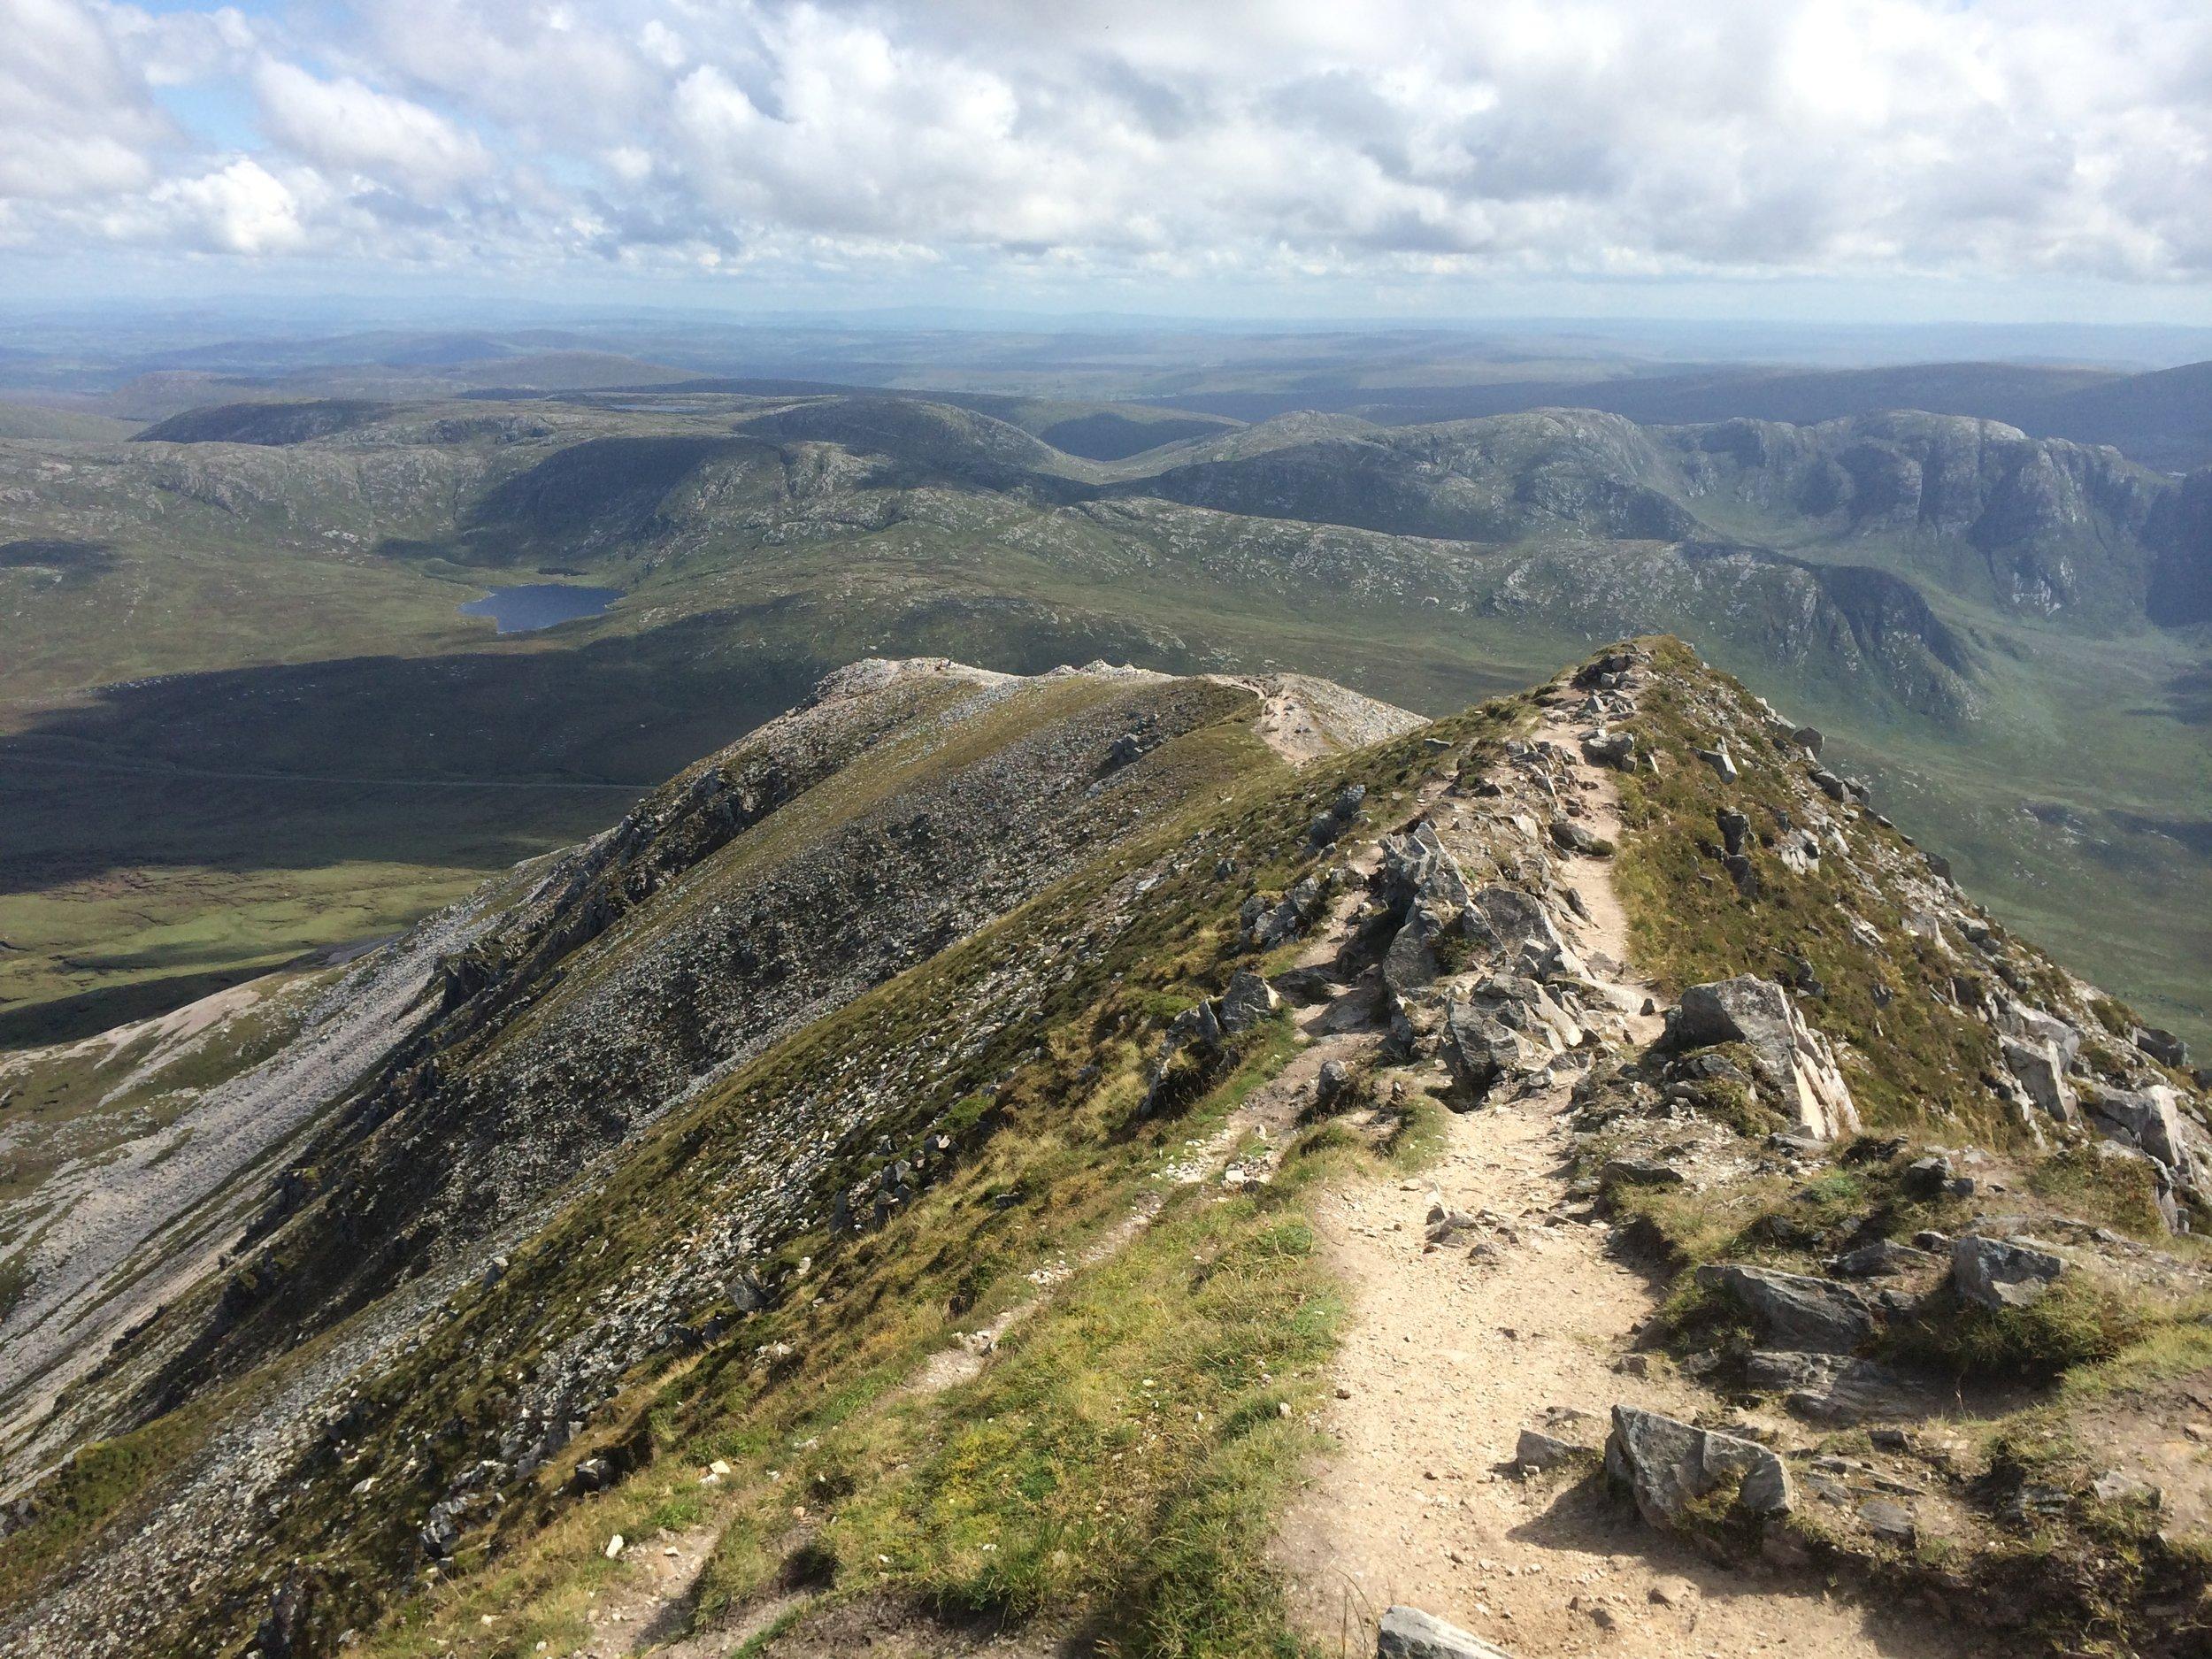 Mt Errigal, Ireland - 2014